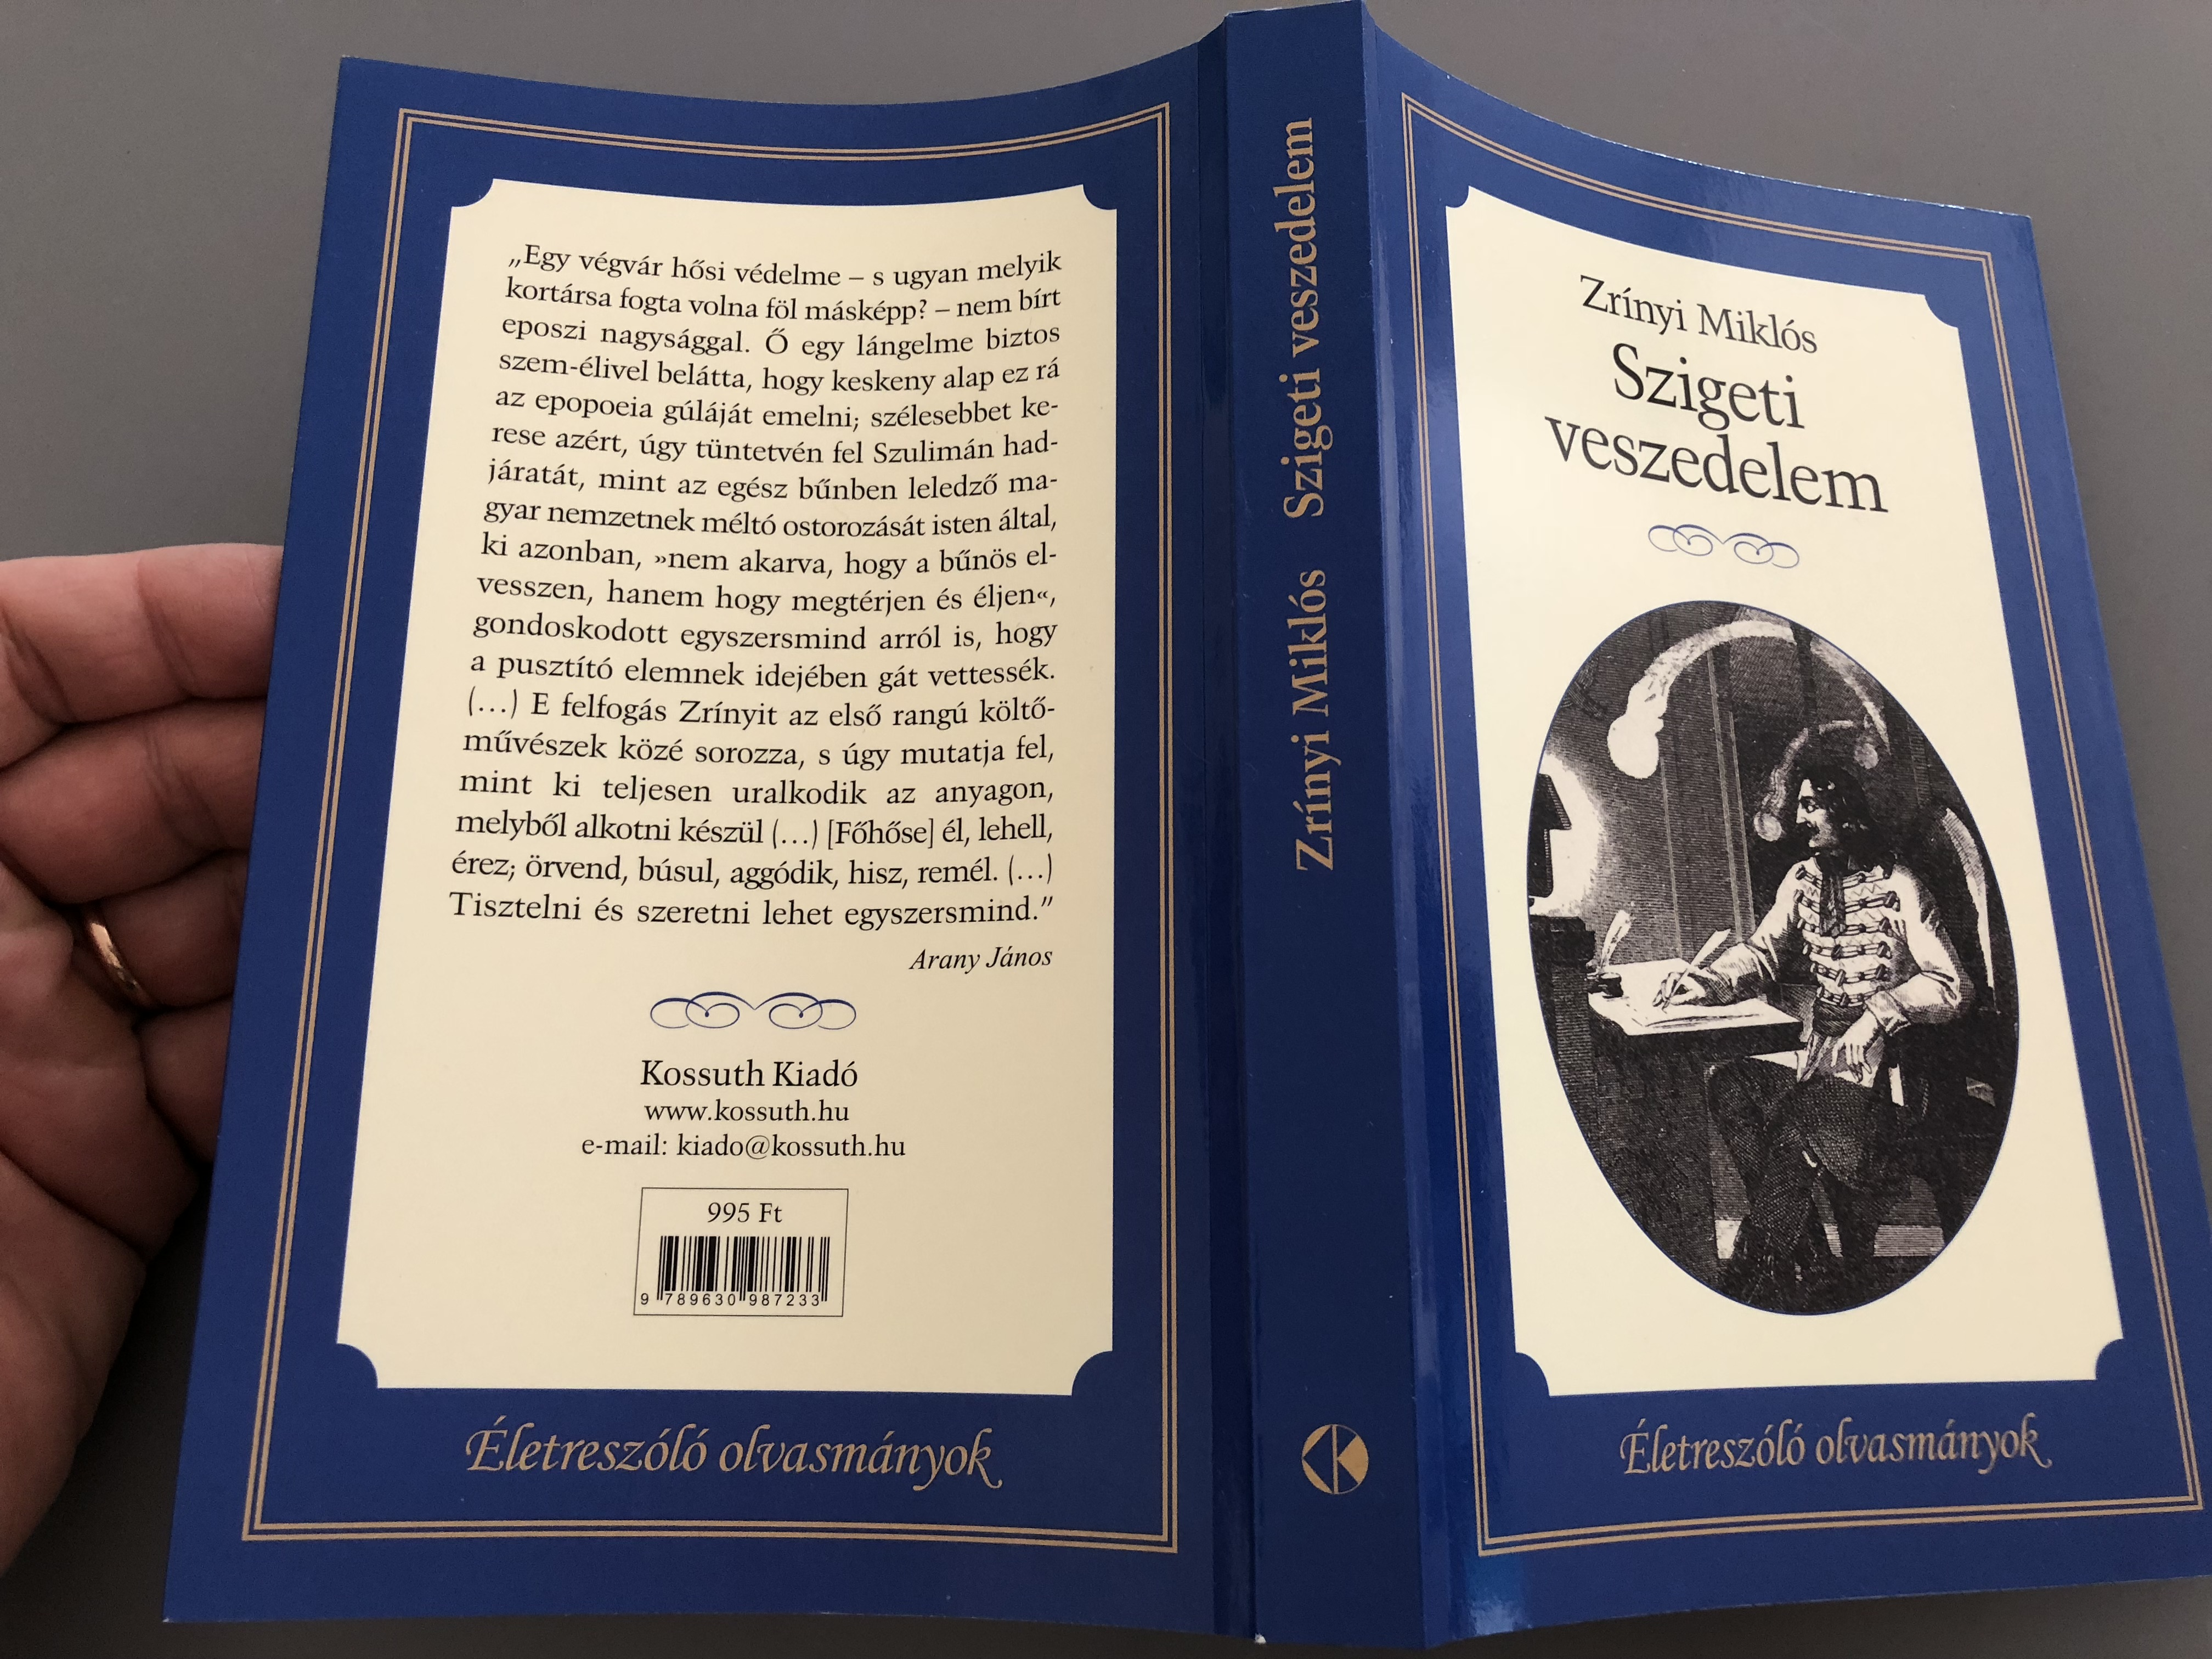 -szigeti-veszedelem-by-zr-nyi-mikl-s-letresz-l-olvasm-nyok-the-siege-of-sziget-hungarian-epic-poem-kossuth-kiad-2017-paperback-11-.jpg